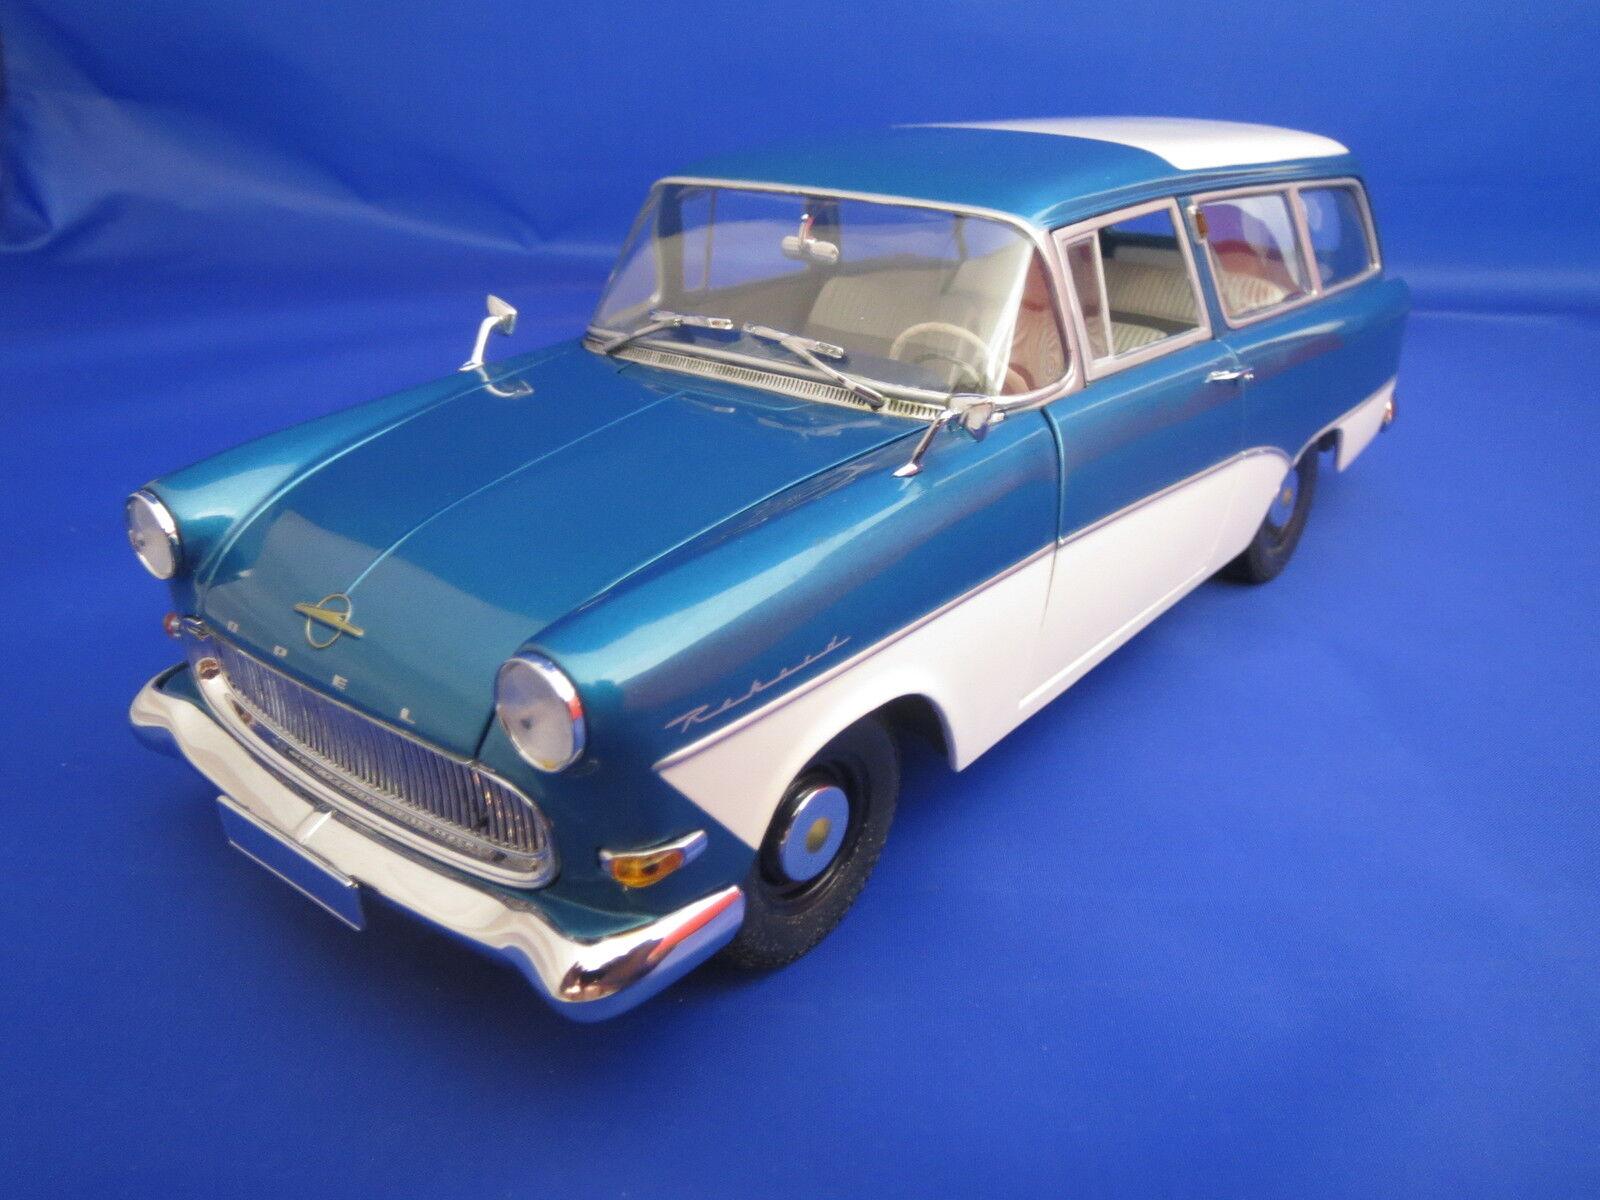 Minichamps OPEL REKORD p1 voitureavan (1958) (bleu Metallic)  1 18 OVP  plus abordable